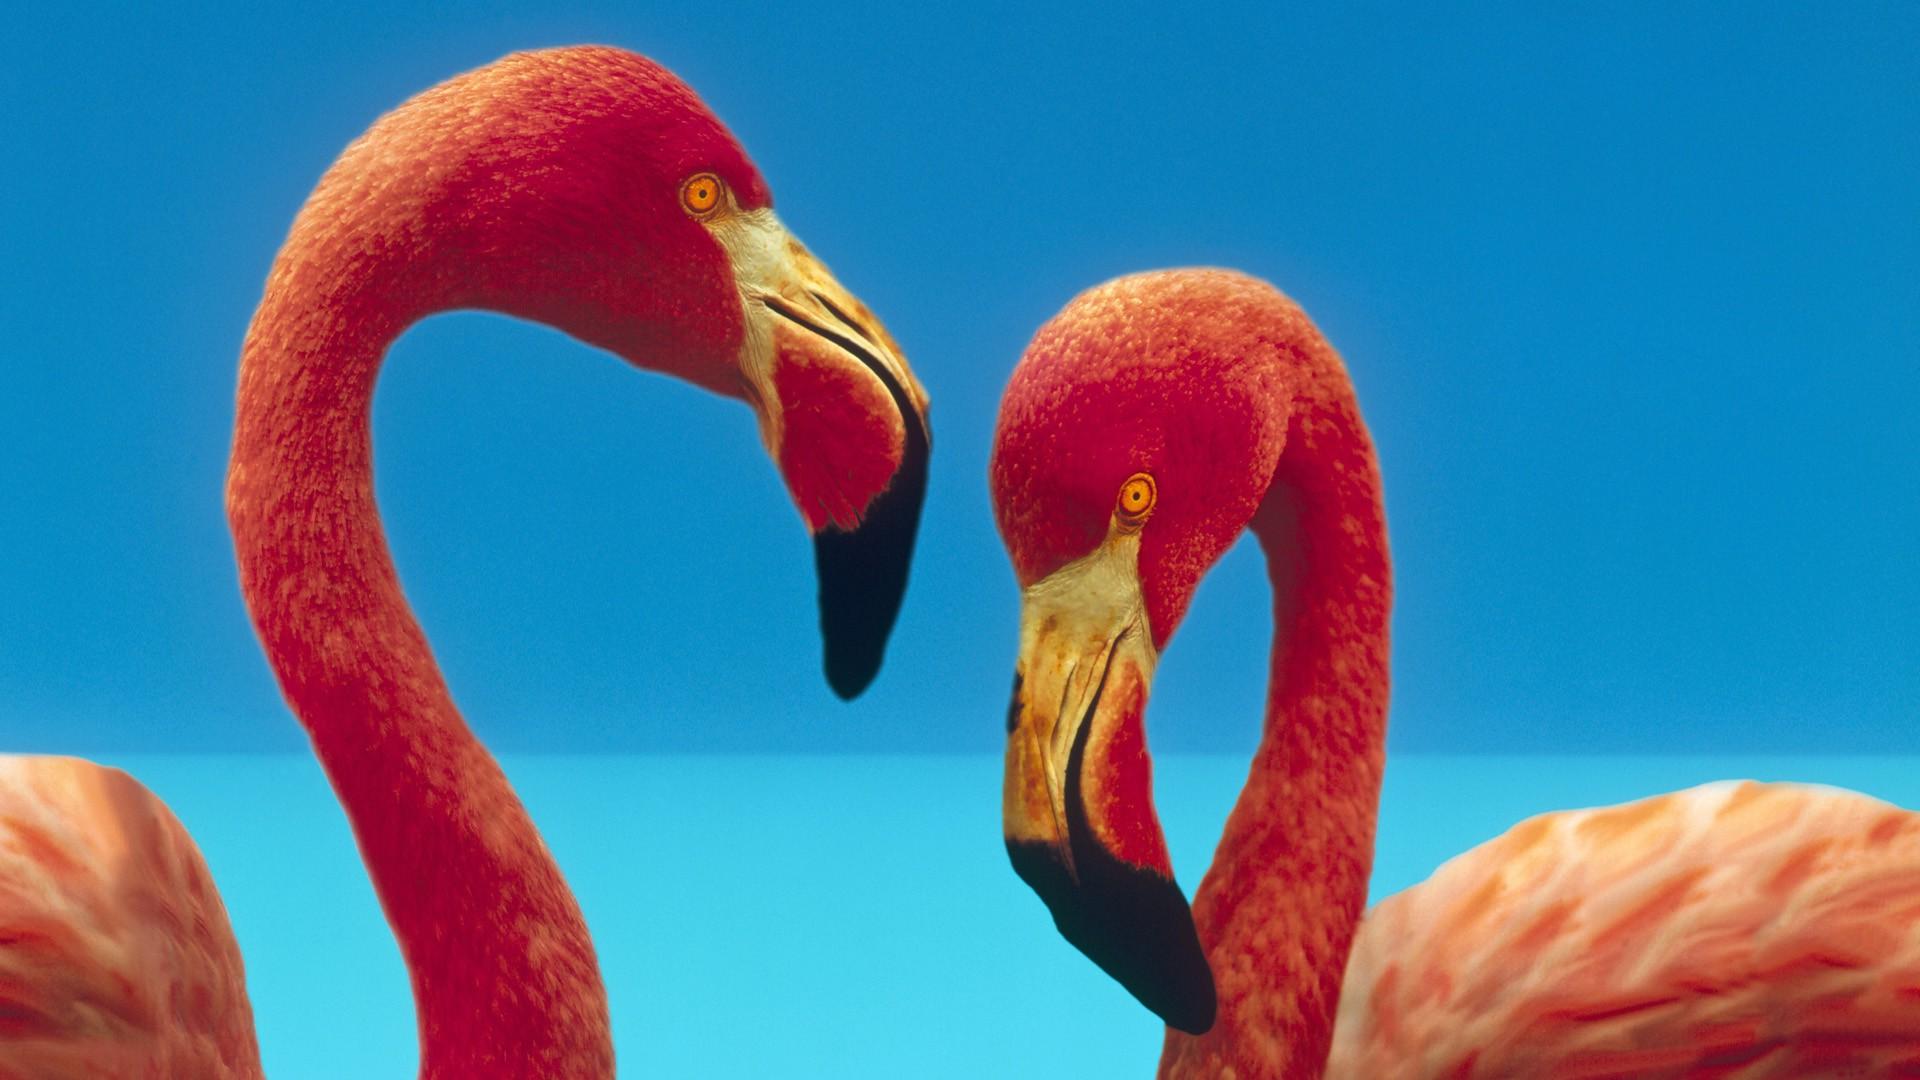 Wallpaper 1920x1080 Px Hewan Burung Burung Flamingo 1920x1080